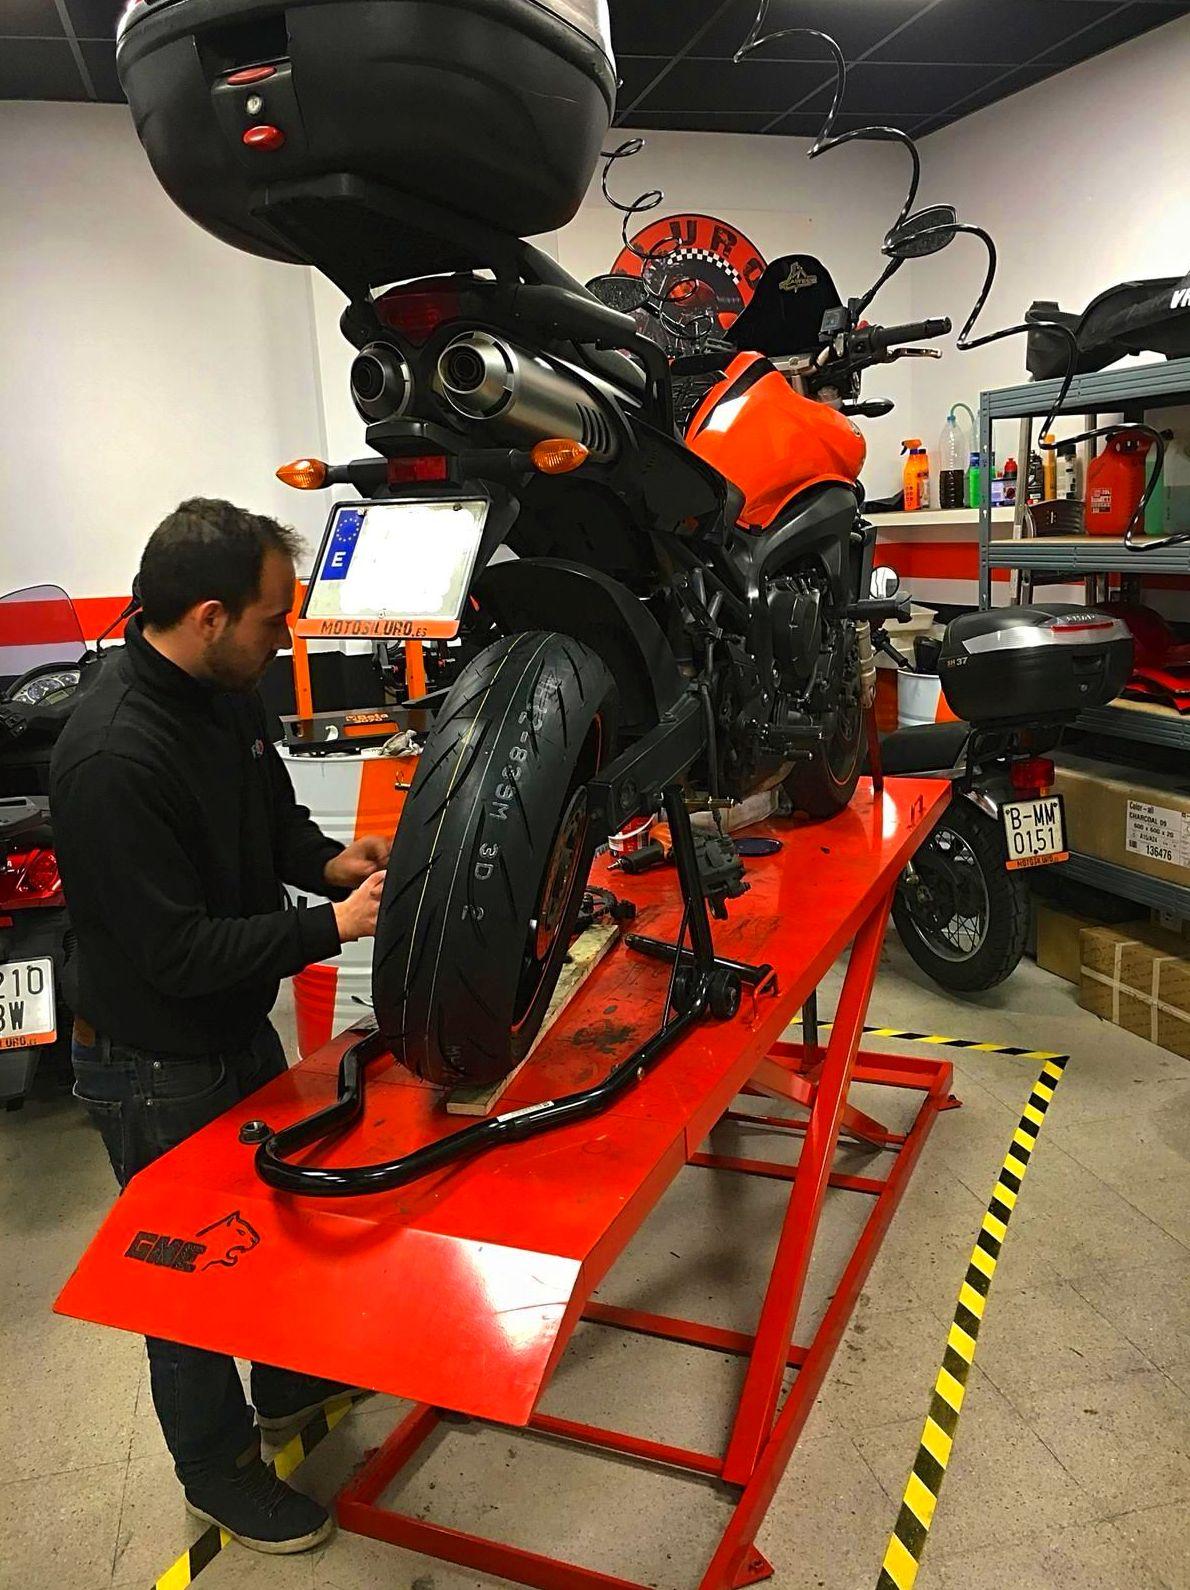 Foto 6 de Taller de motos multimarca en Mataró | Motos Iluro